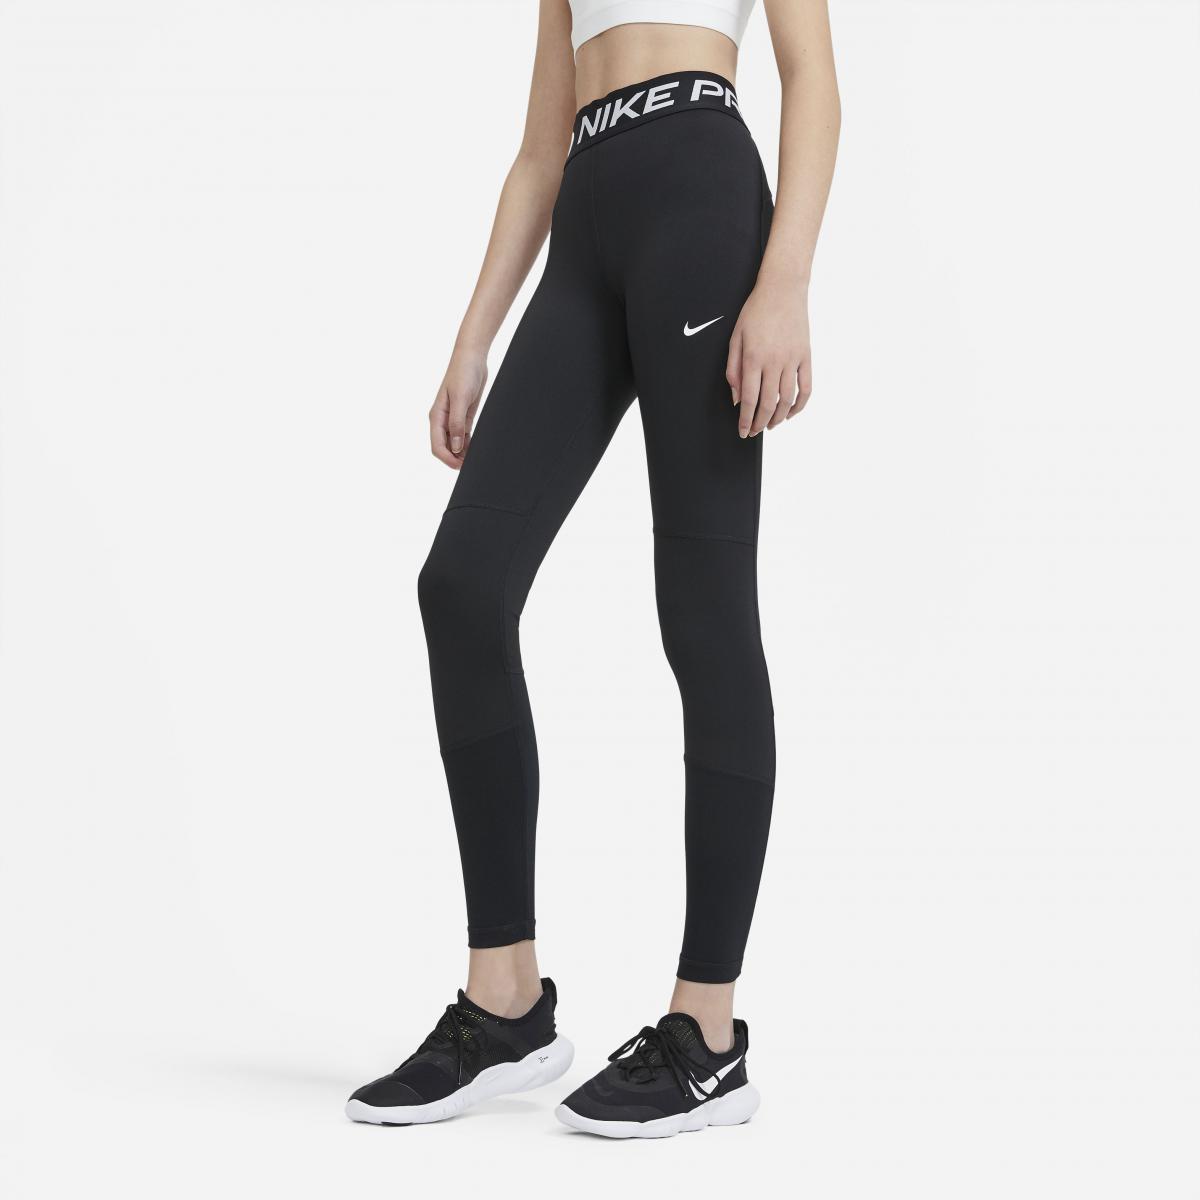 Nike G NP LEGGING, tights